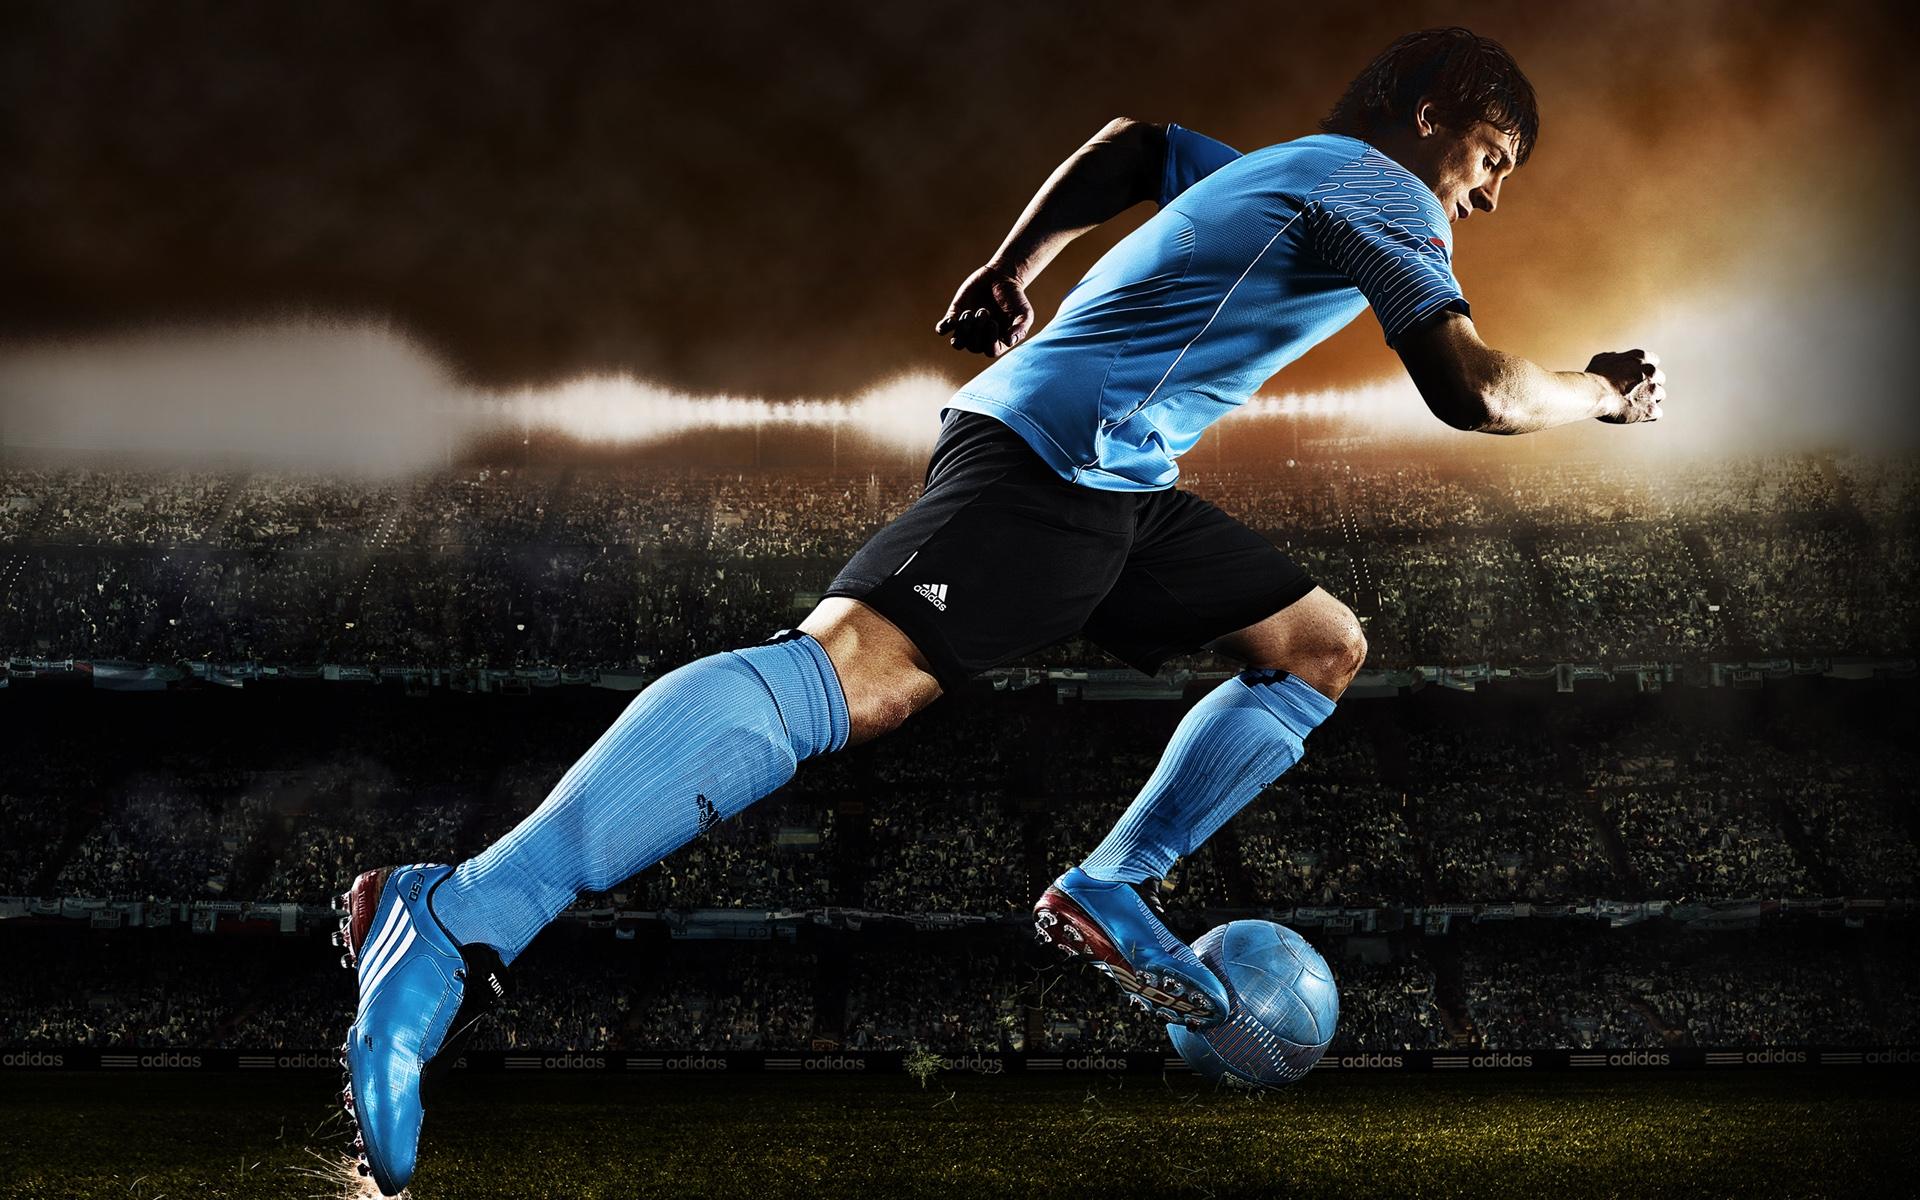 Hd Desktop Wallpaper For Football Lovers: HD Football Kick Wallpapers